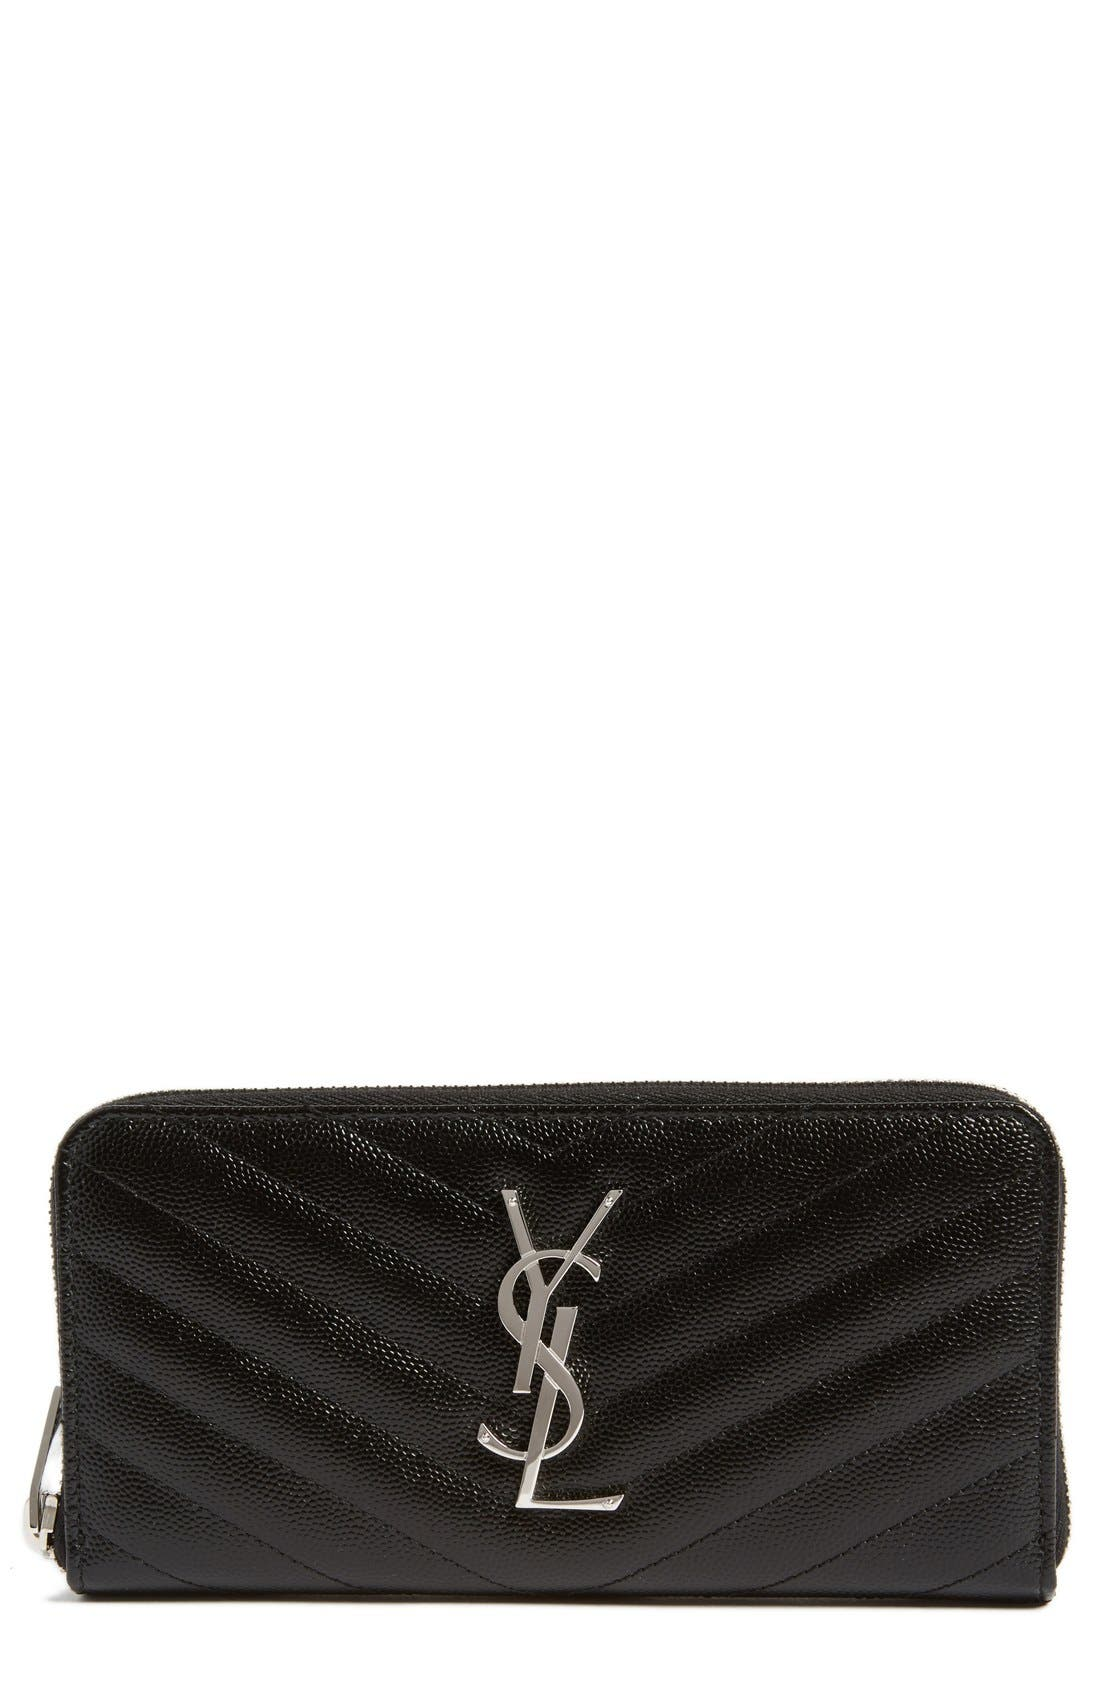 Saint Laurent 'Monogram' Zip Around Quilted Calfskin Leather Wallet